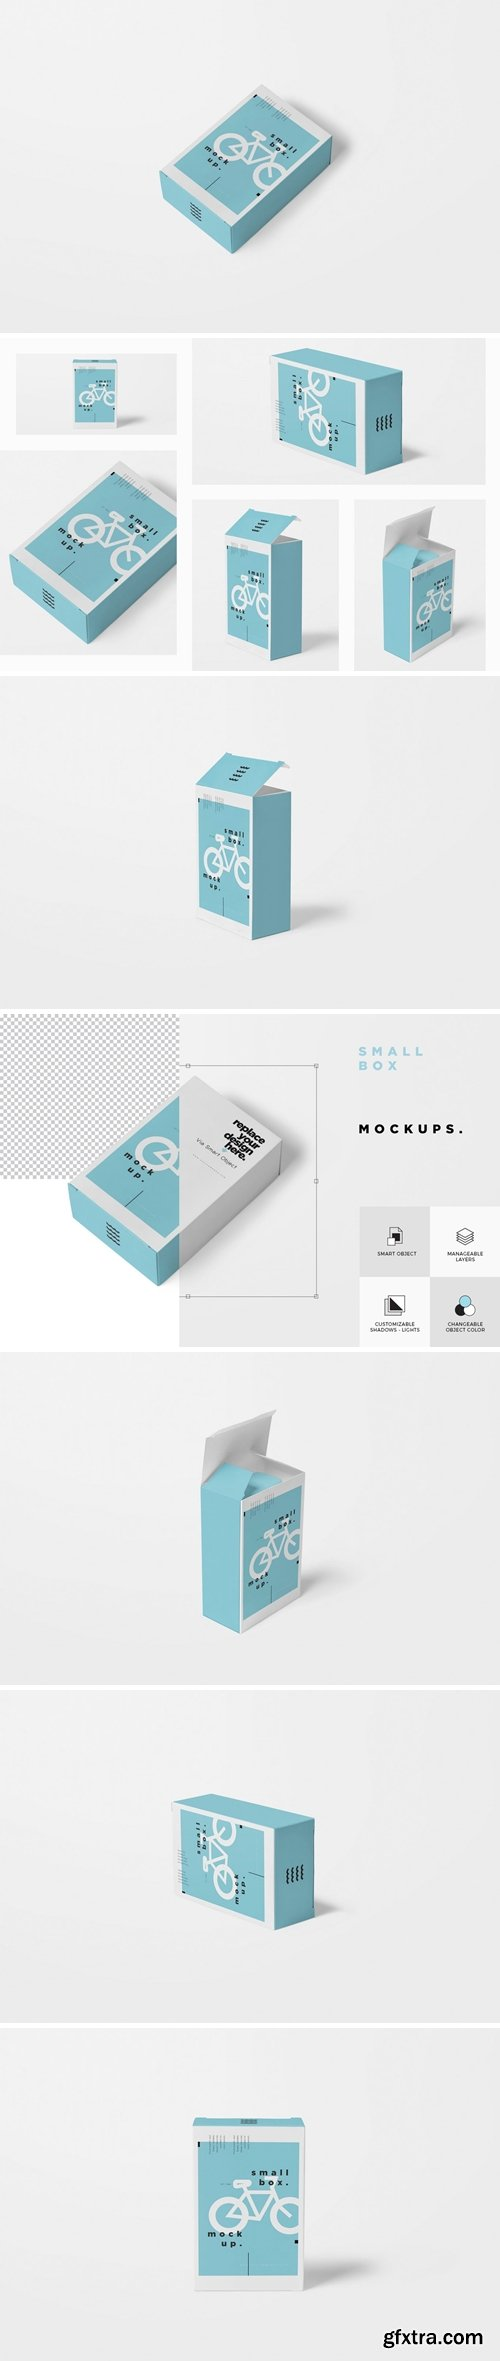 CM - Small cardboard box mockups 3483309